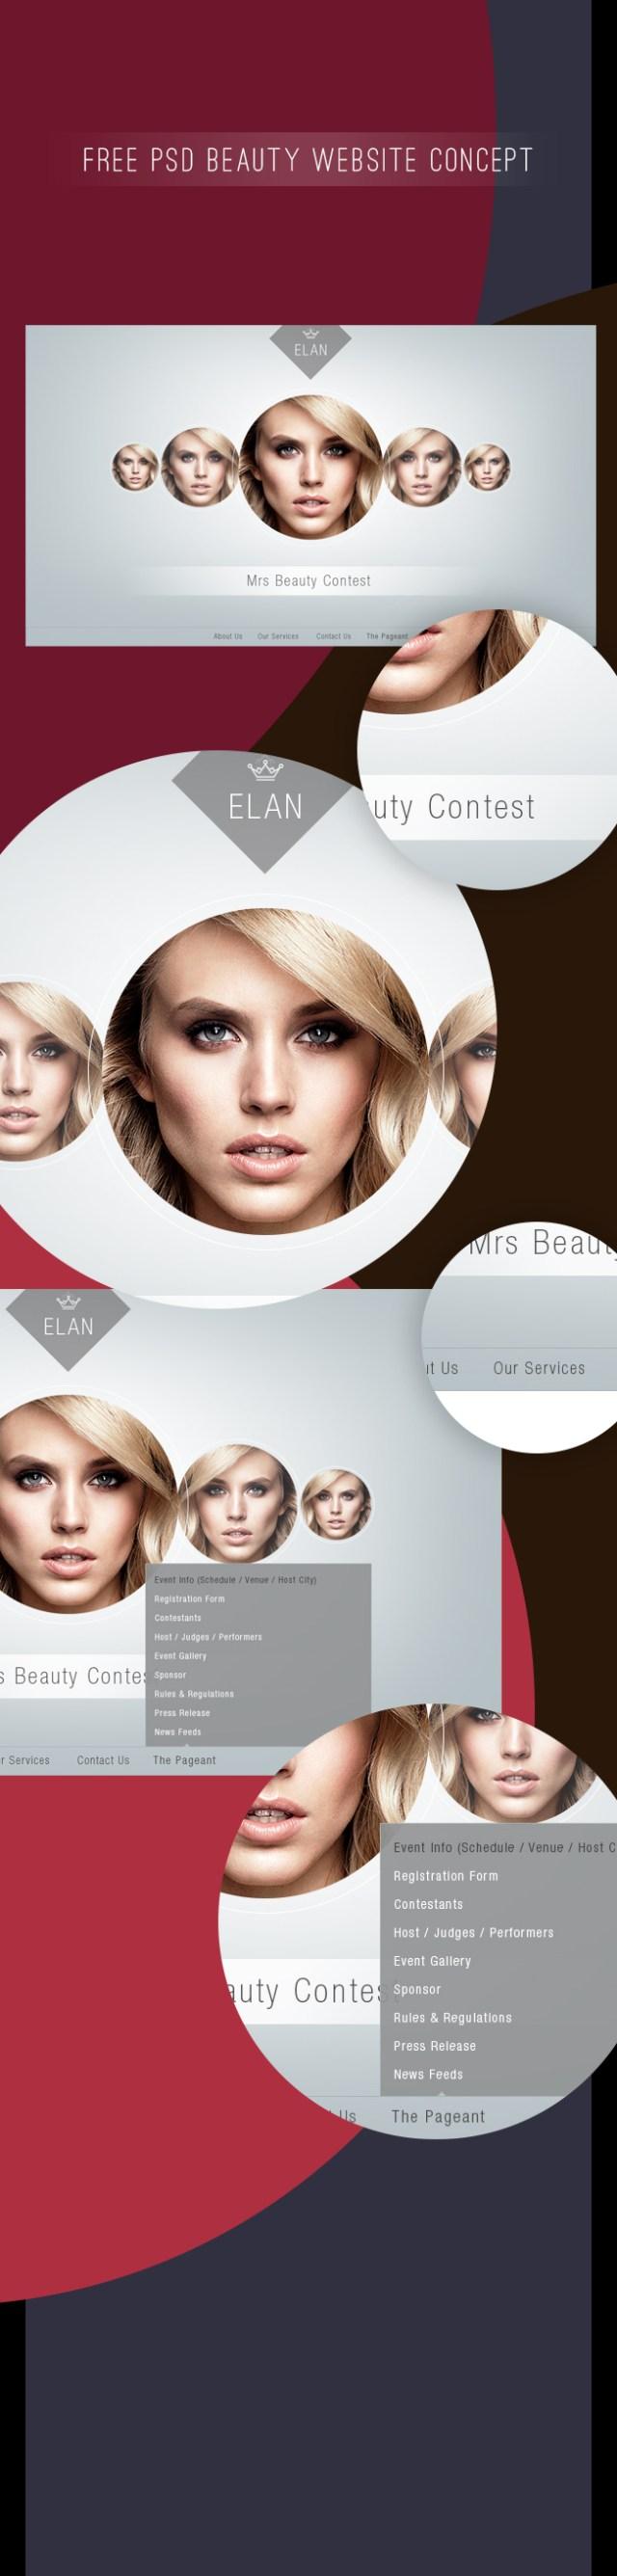 Free PSD Beauty Website Design Concept